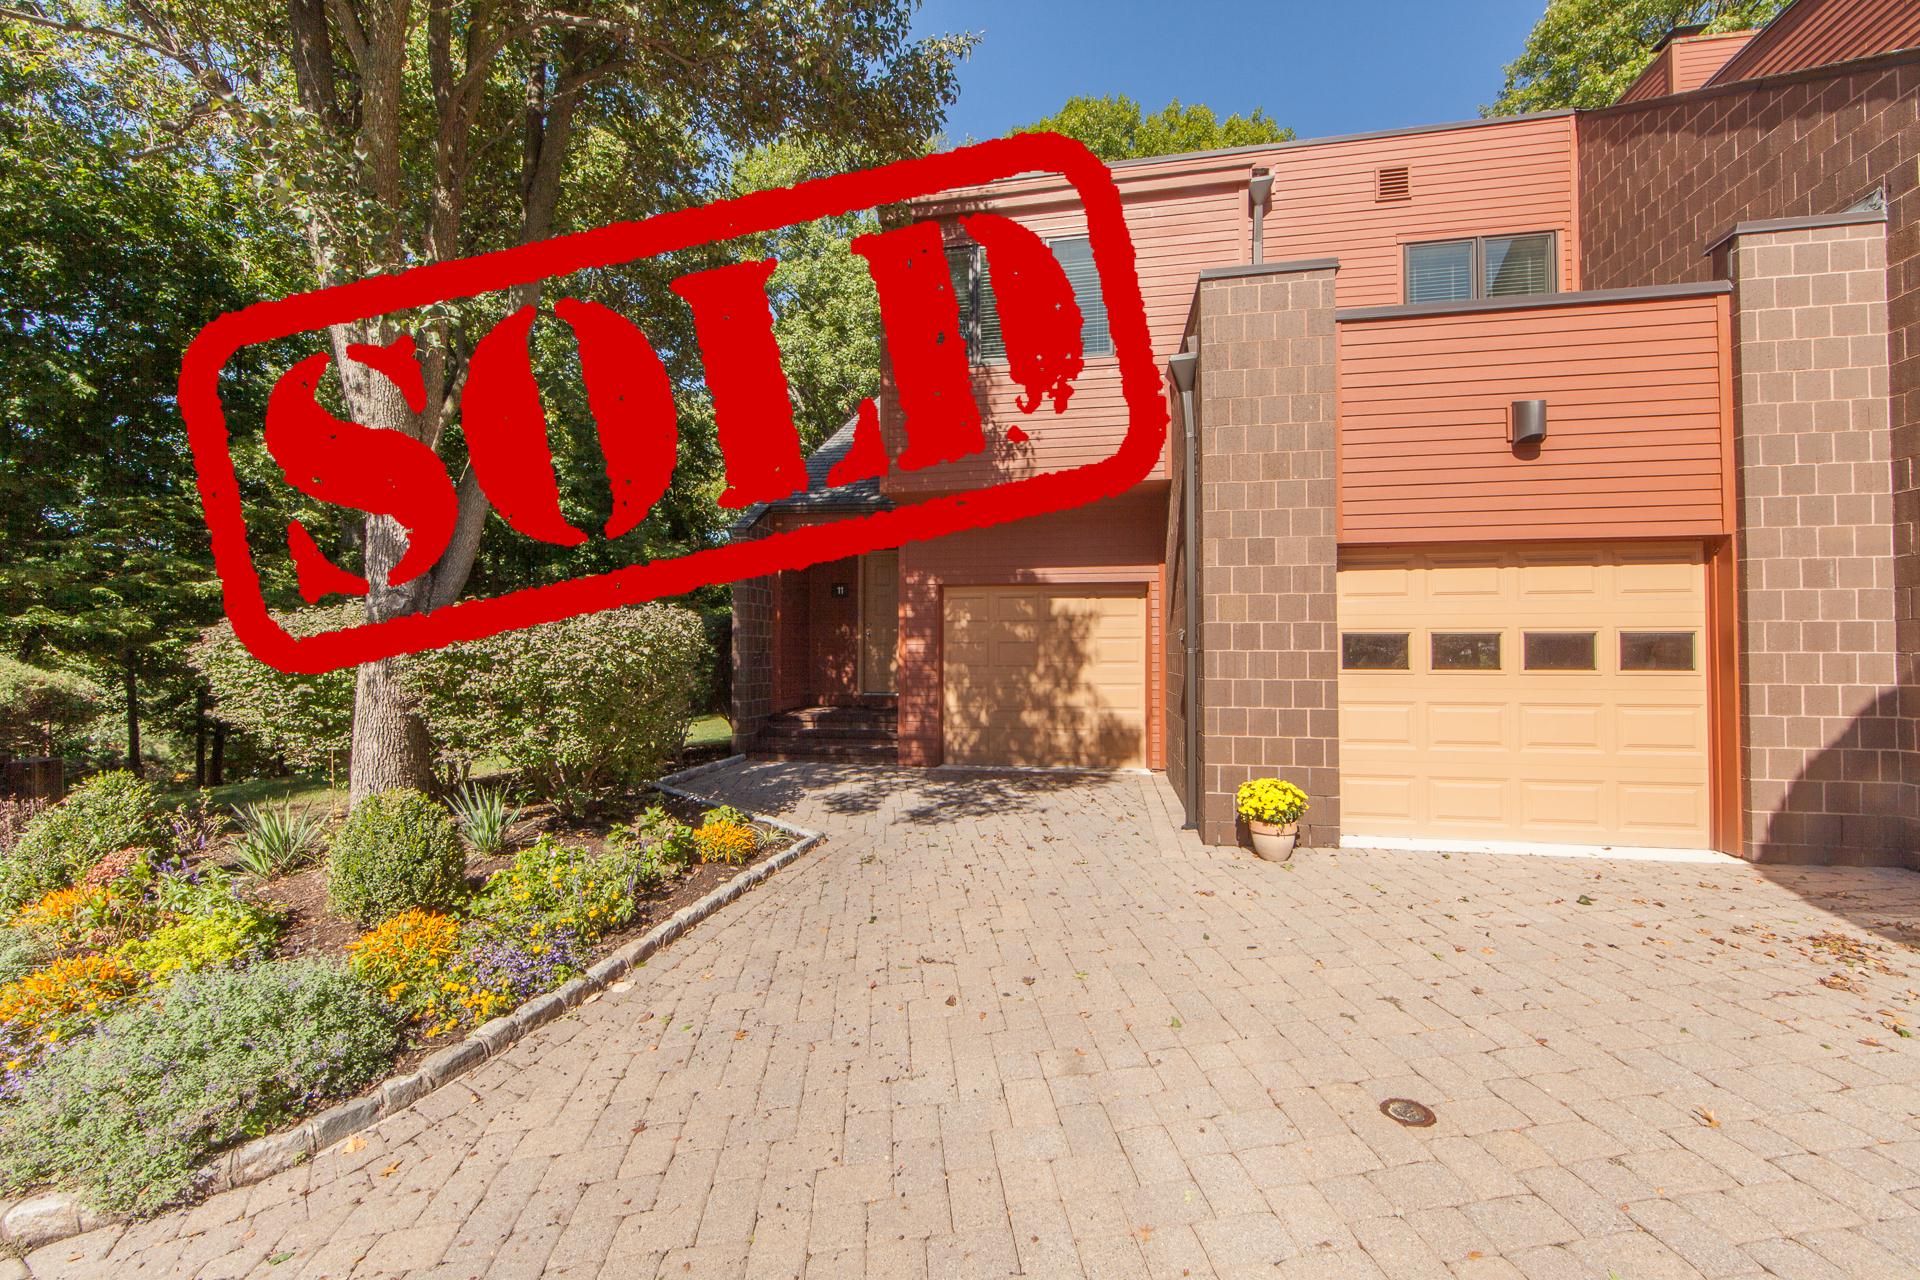 11 HIDDEN LEDGE, ENGLEWOOD NJ - $745,000 // just sold!